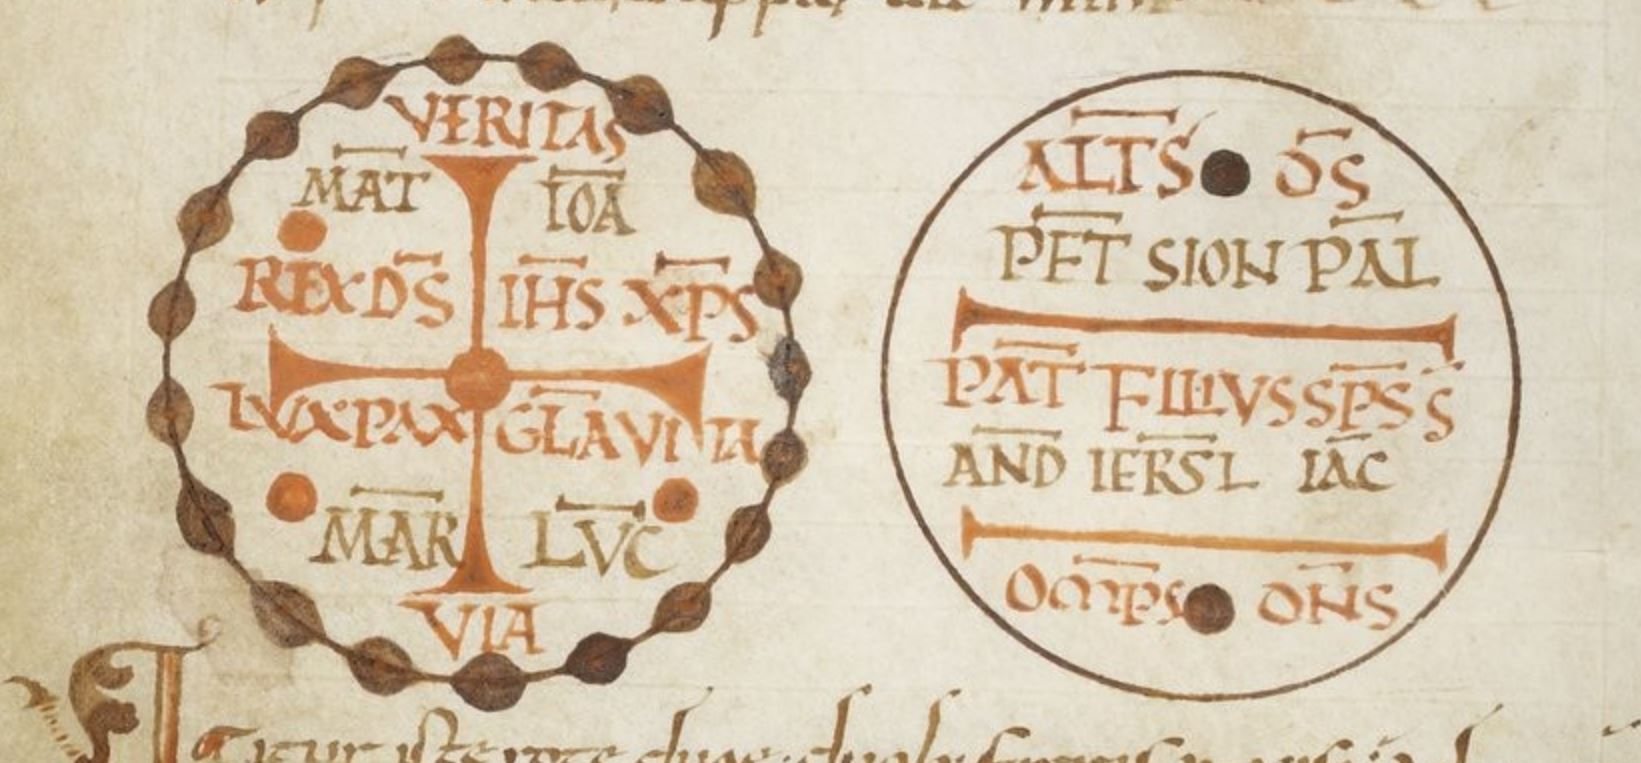 900-1000 PASCHASIUS RADBERTUS, Latin 2855 fol 63v. gallica